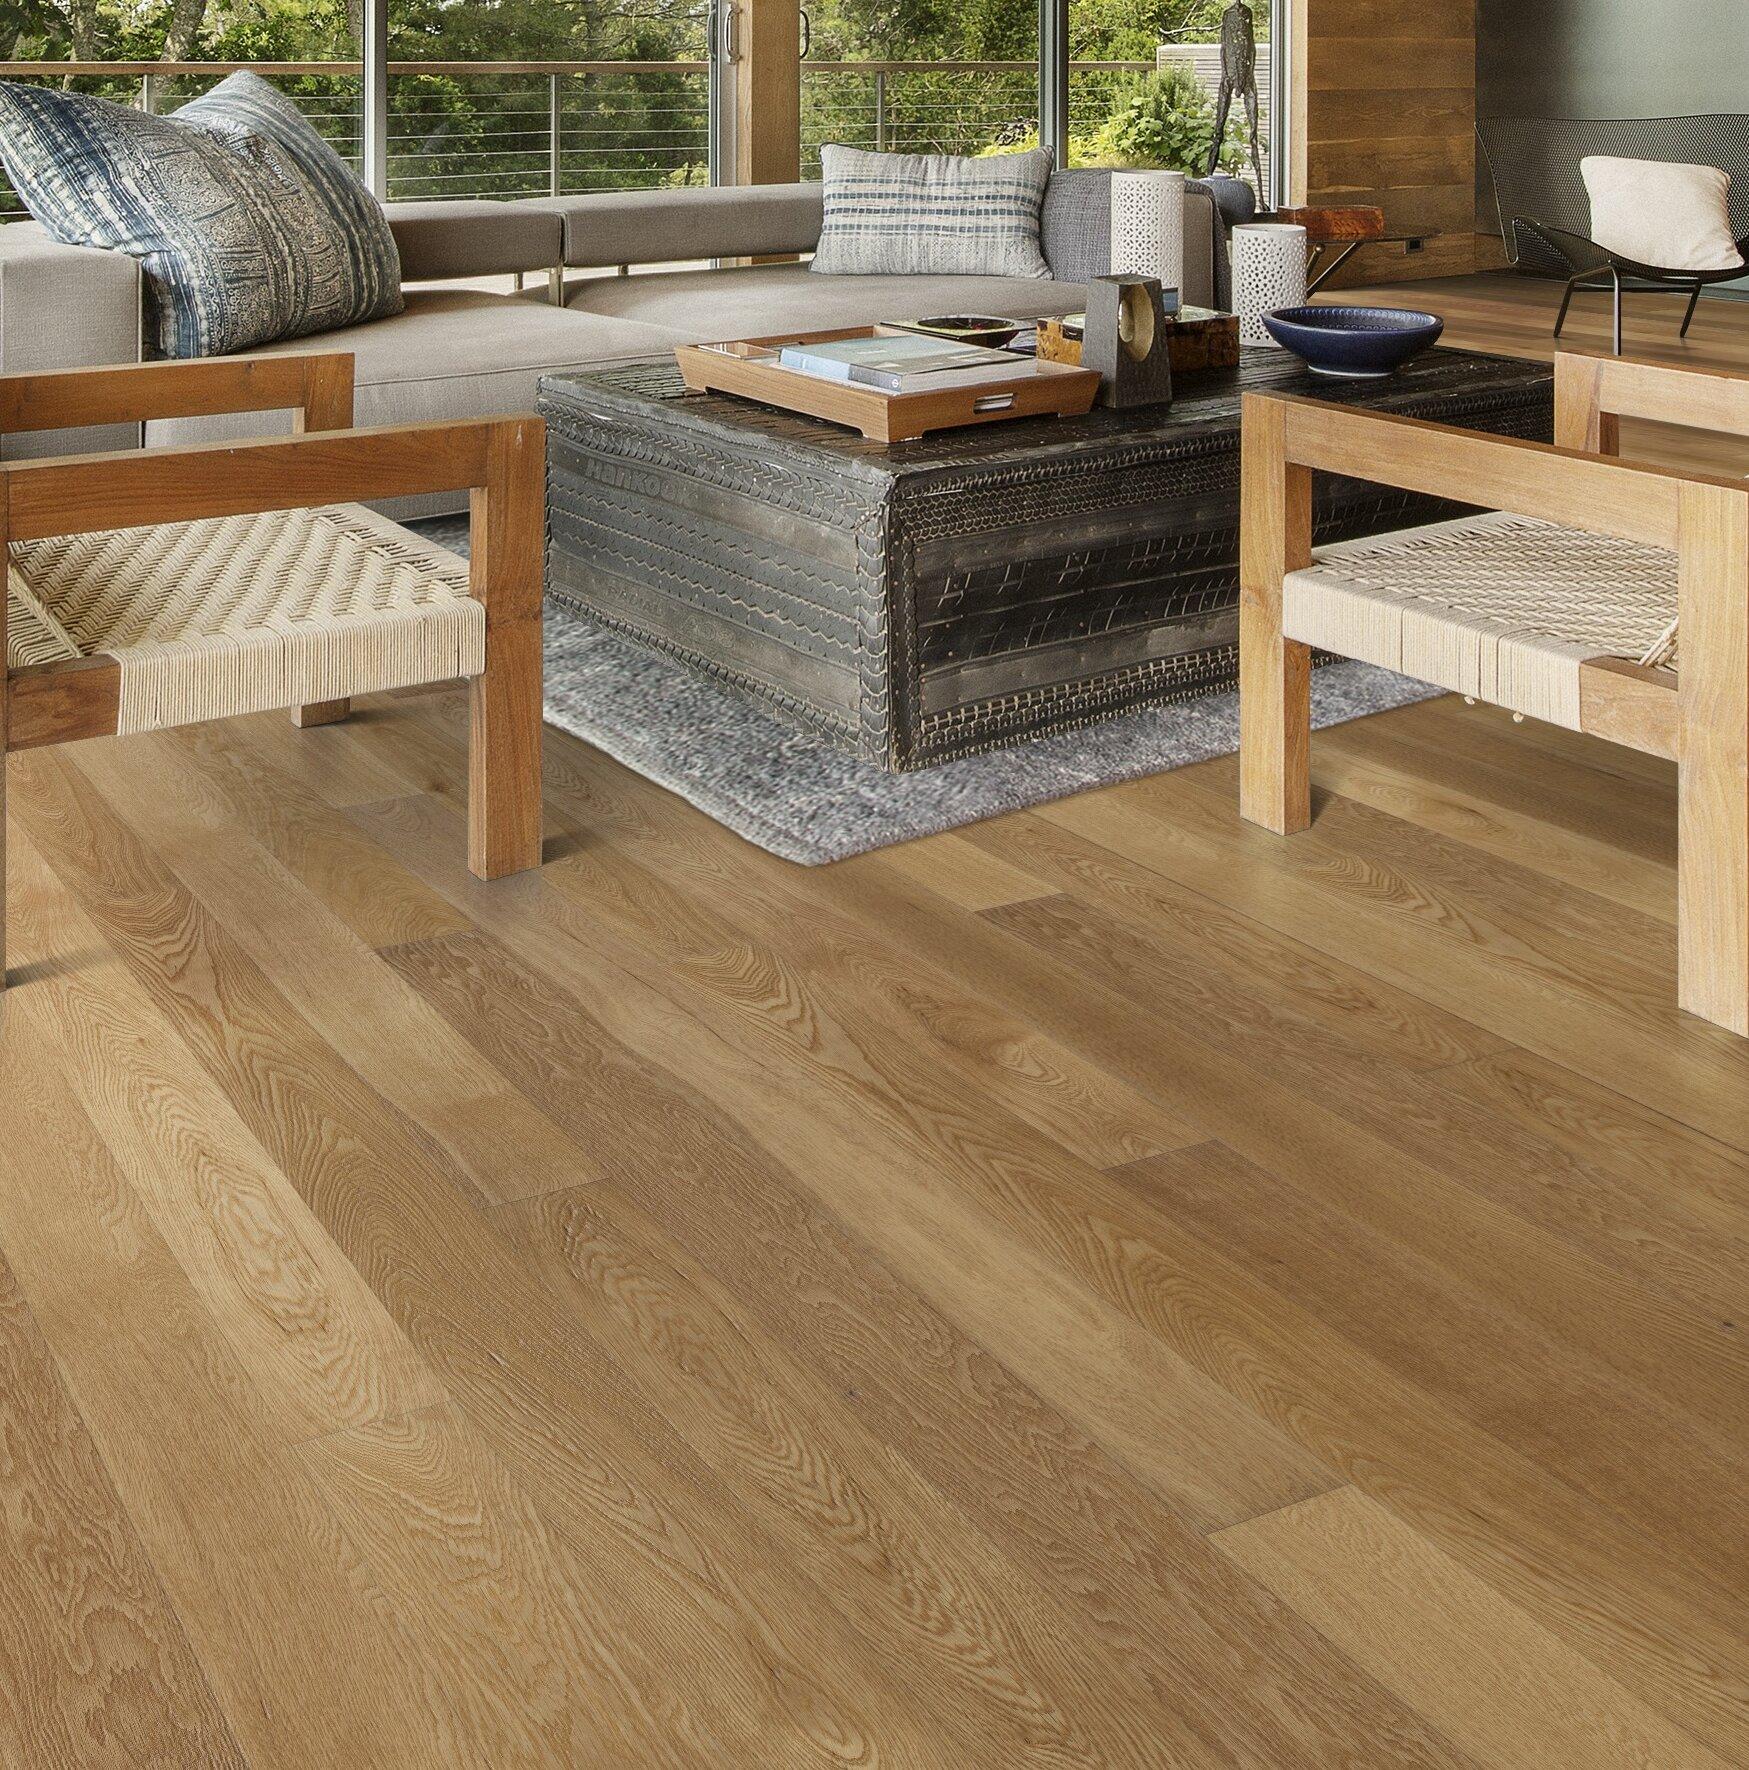 Kahrs Canvas Oak 1 2 Thick X 5 Wide X 73 Length Engineered Hardwood Flooring Wayfair